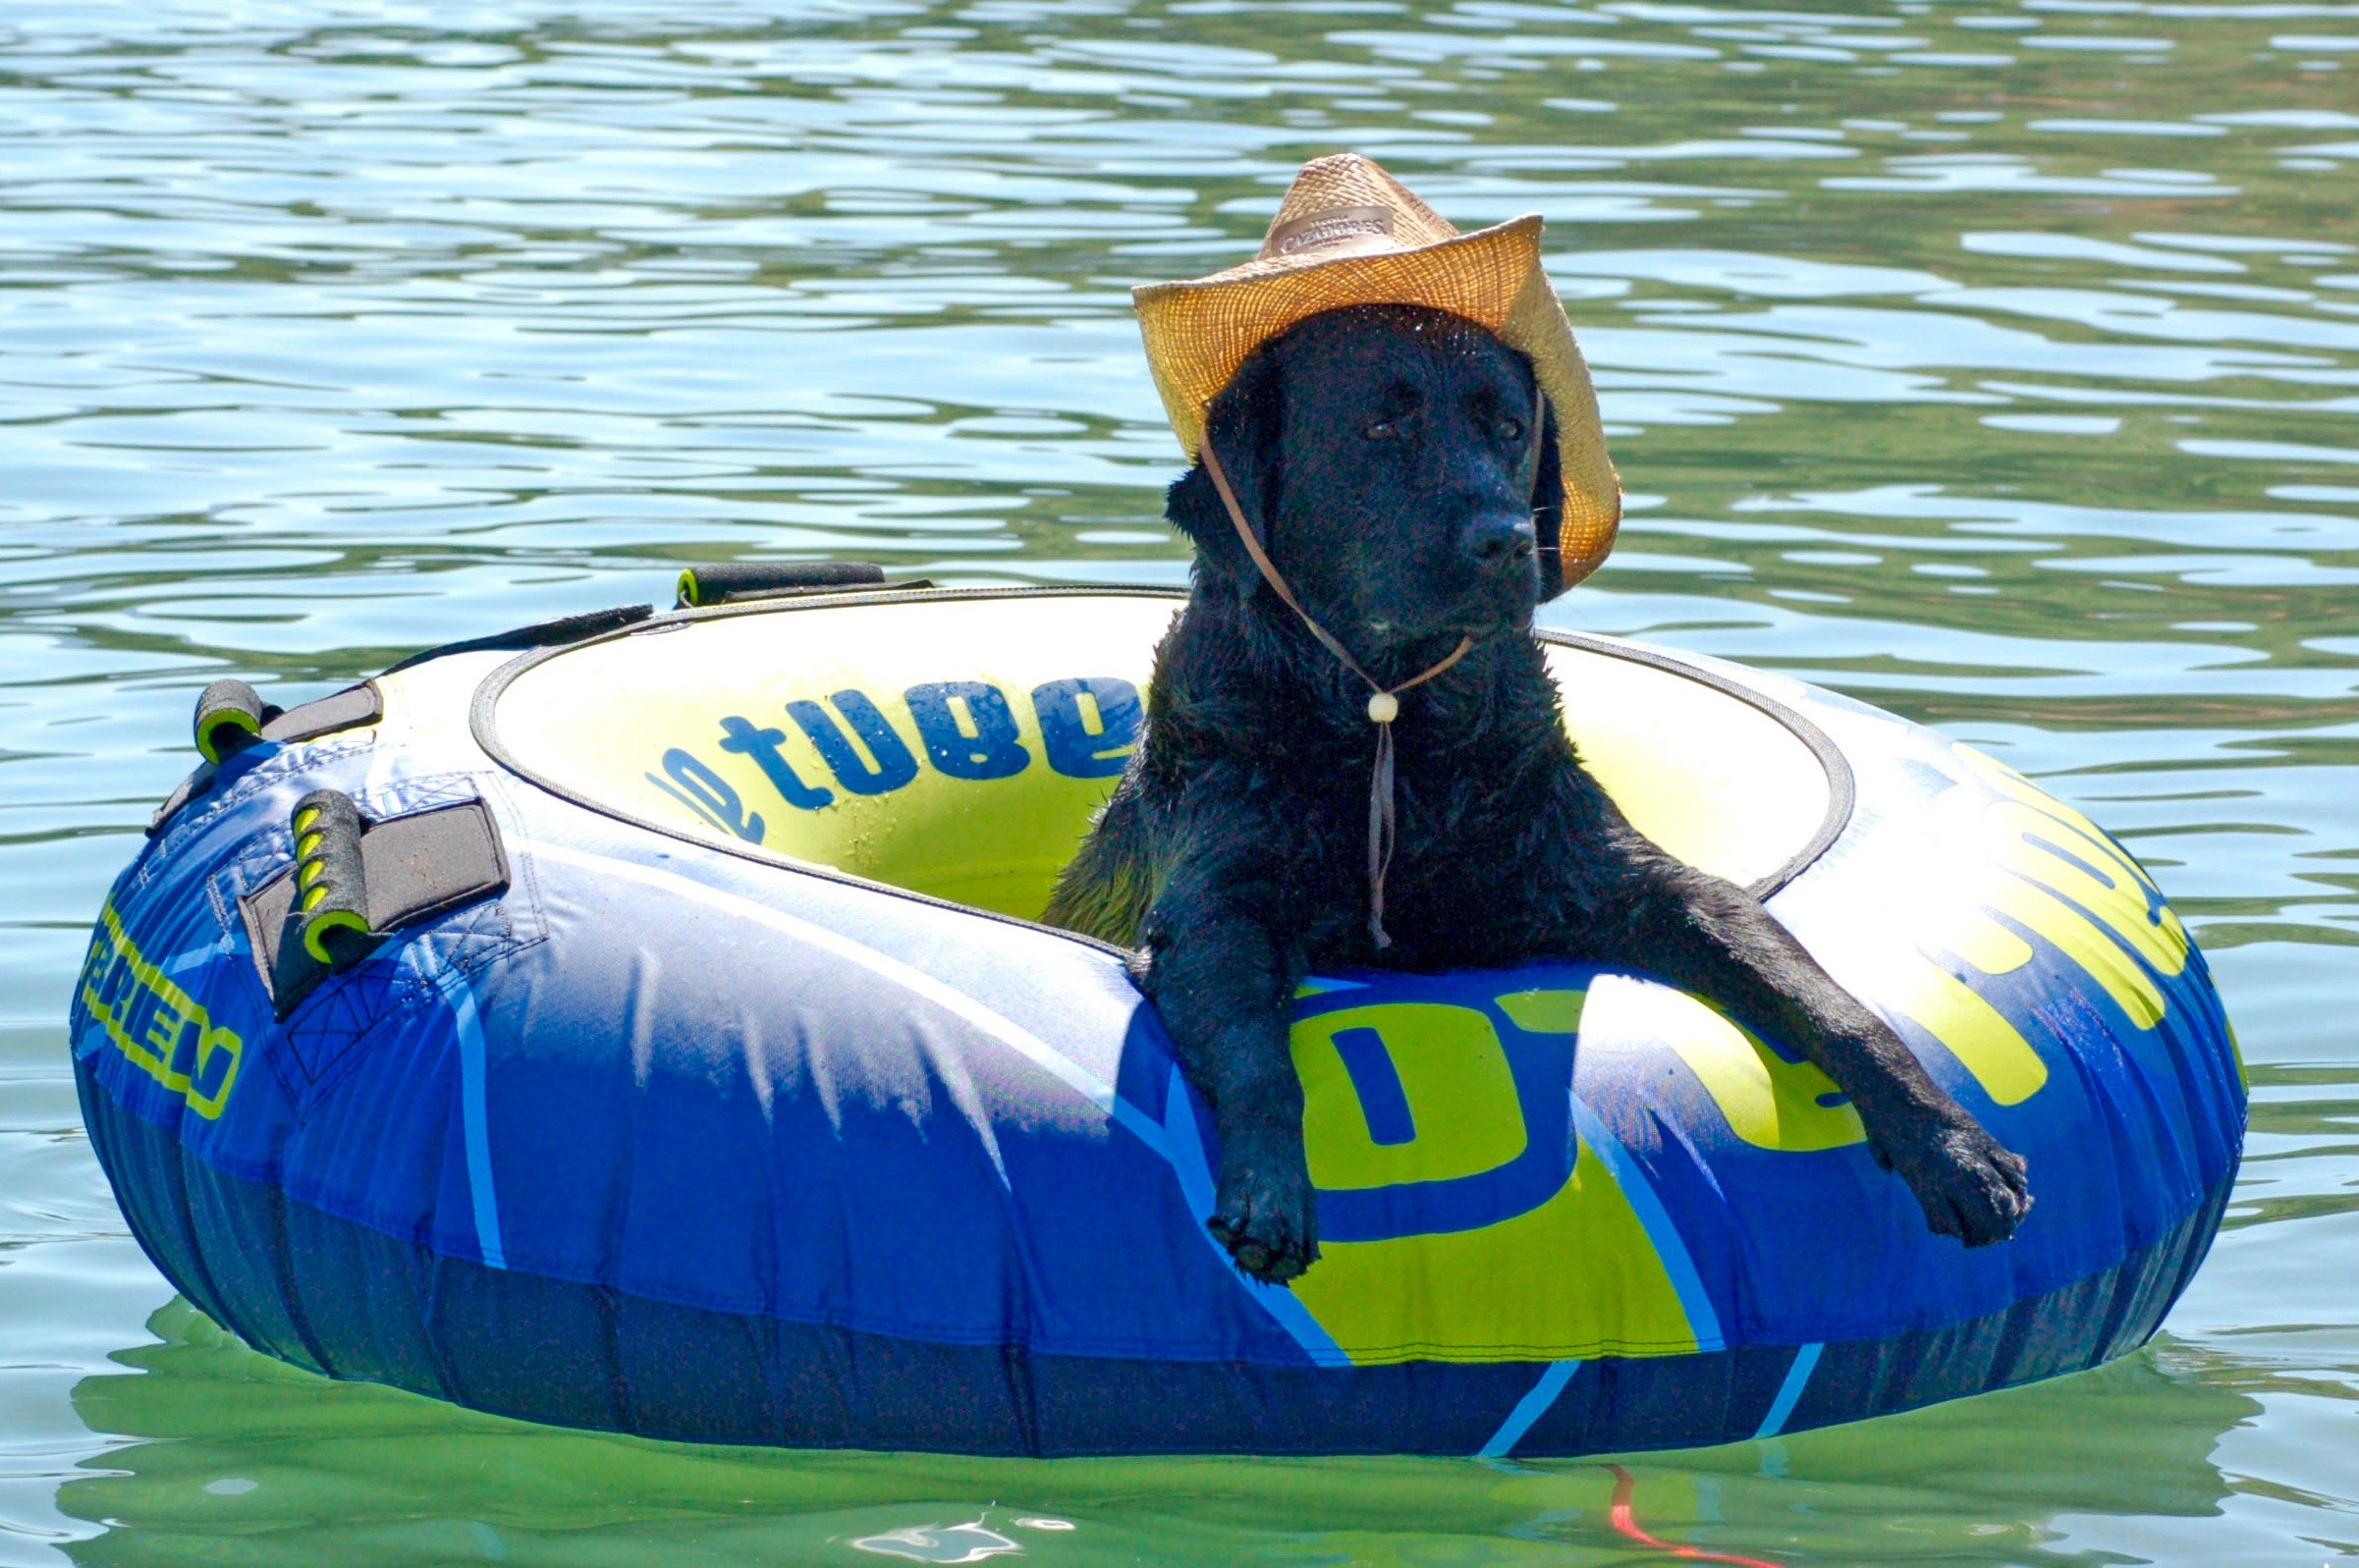 Truffle had style at the lake!